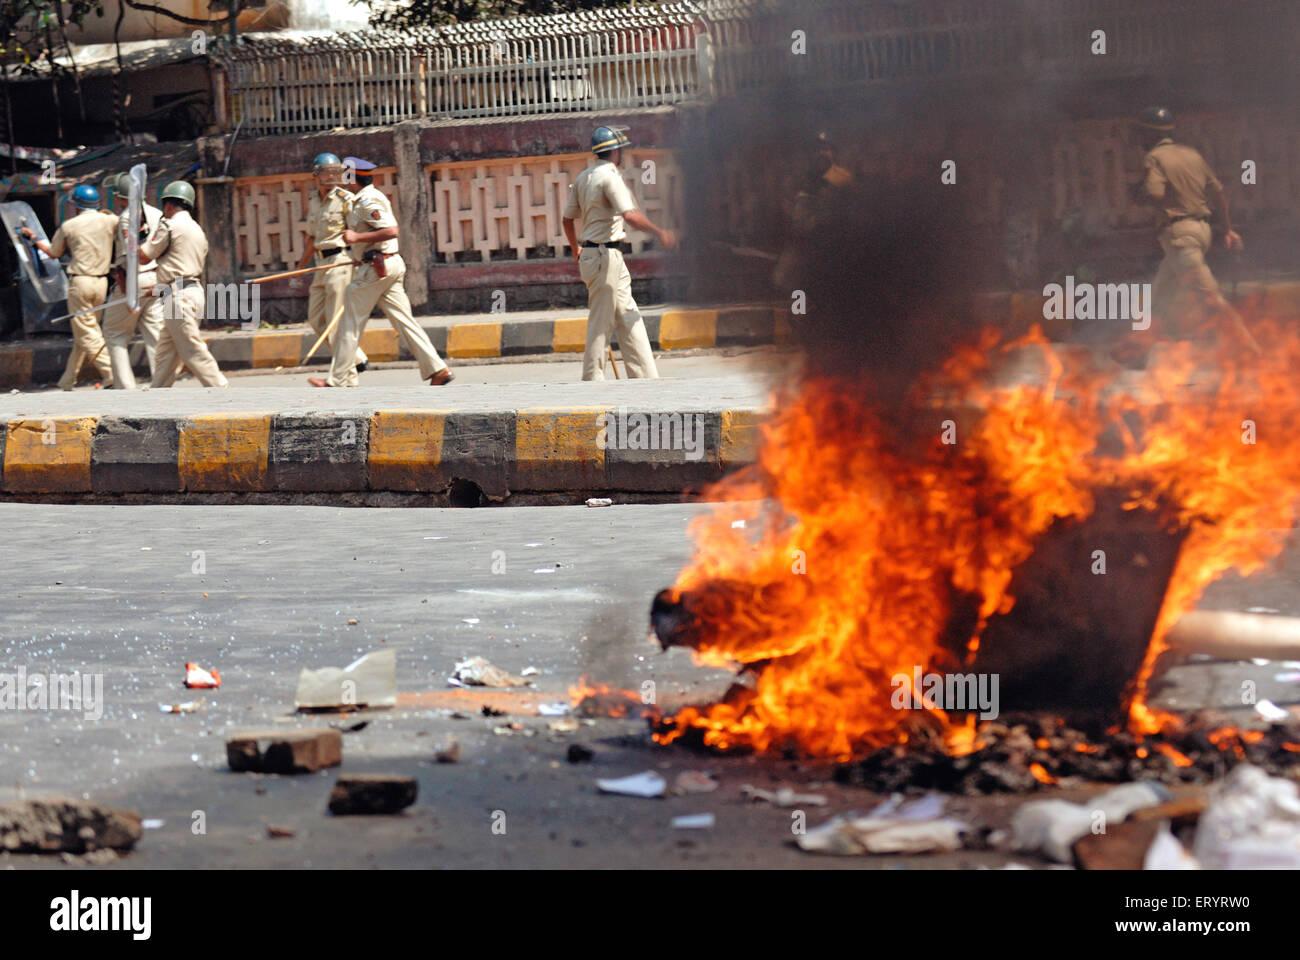 Protesta violenta bruciando immondizia sulla strada ; Bandra ; Mumbai Bombay ; Maharashtra ; India 21 Ottobre 2008 Immagini Stock